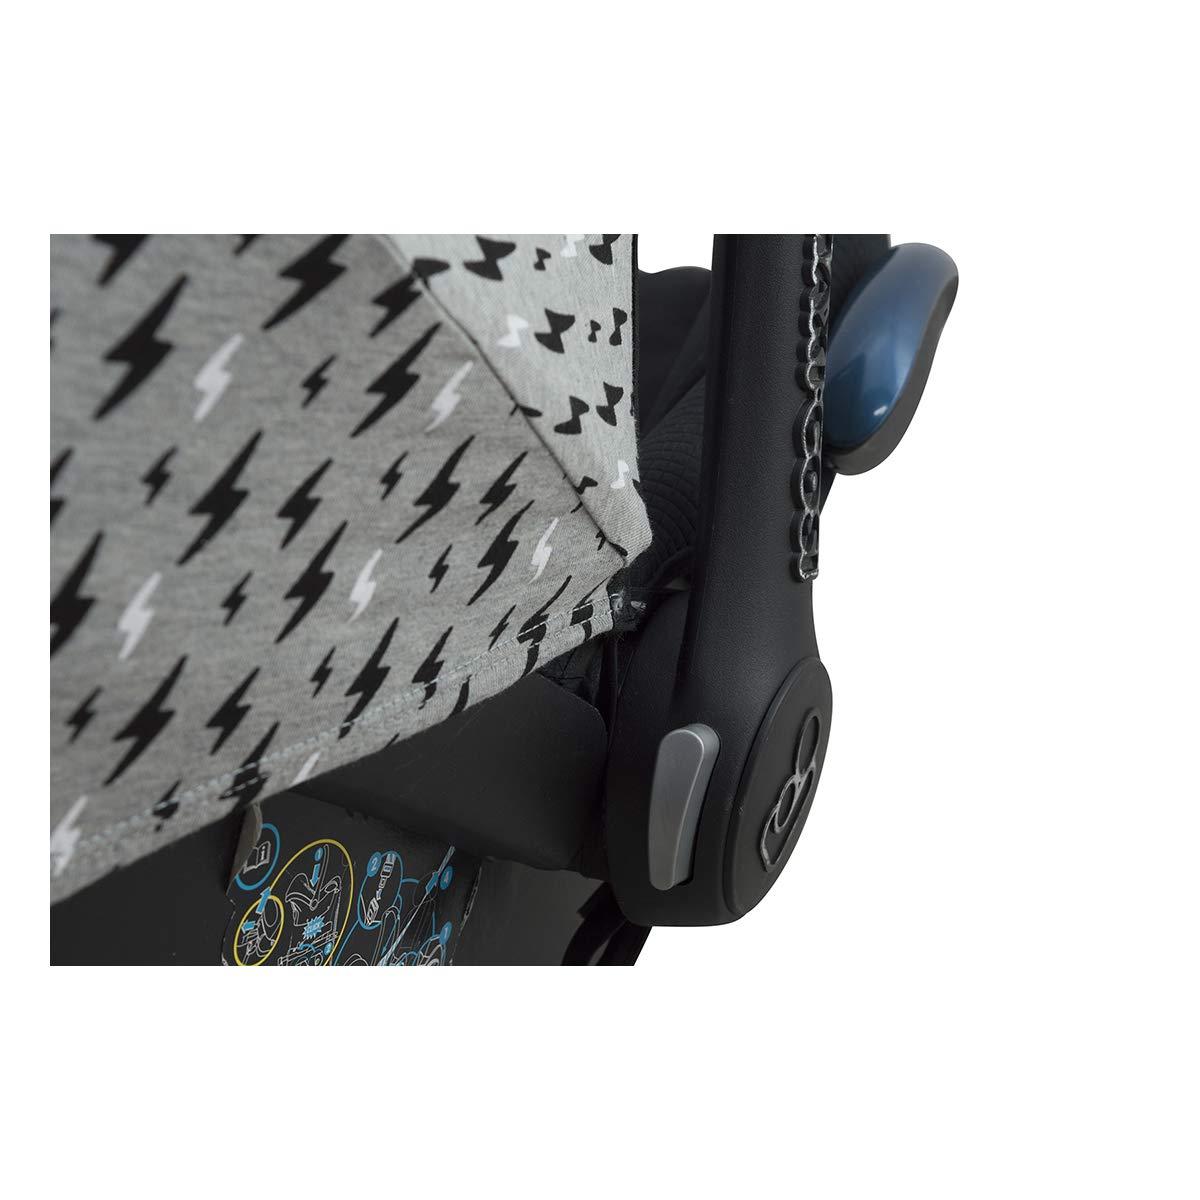 Black Star JANABEBE Hood Canopy for Maxi COSI Cabriofix and Maxi COSI Pebble